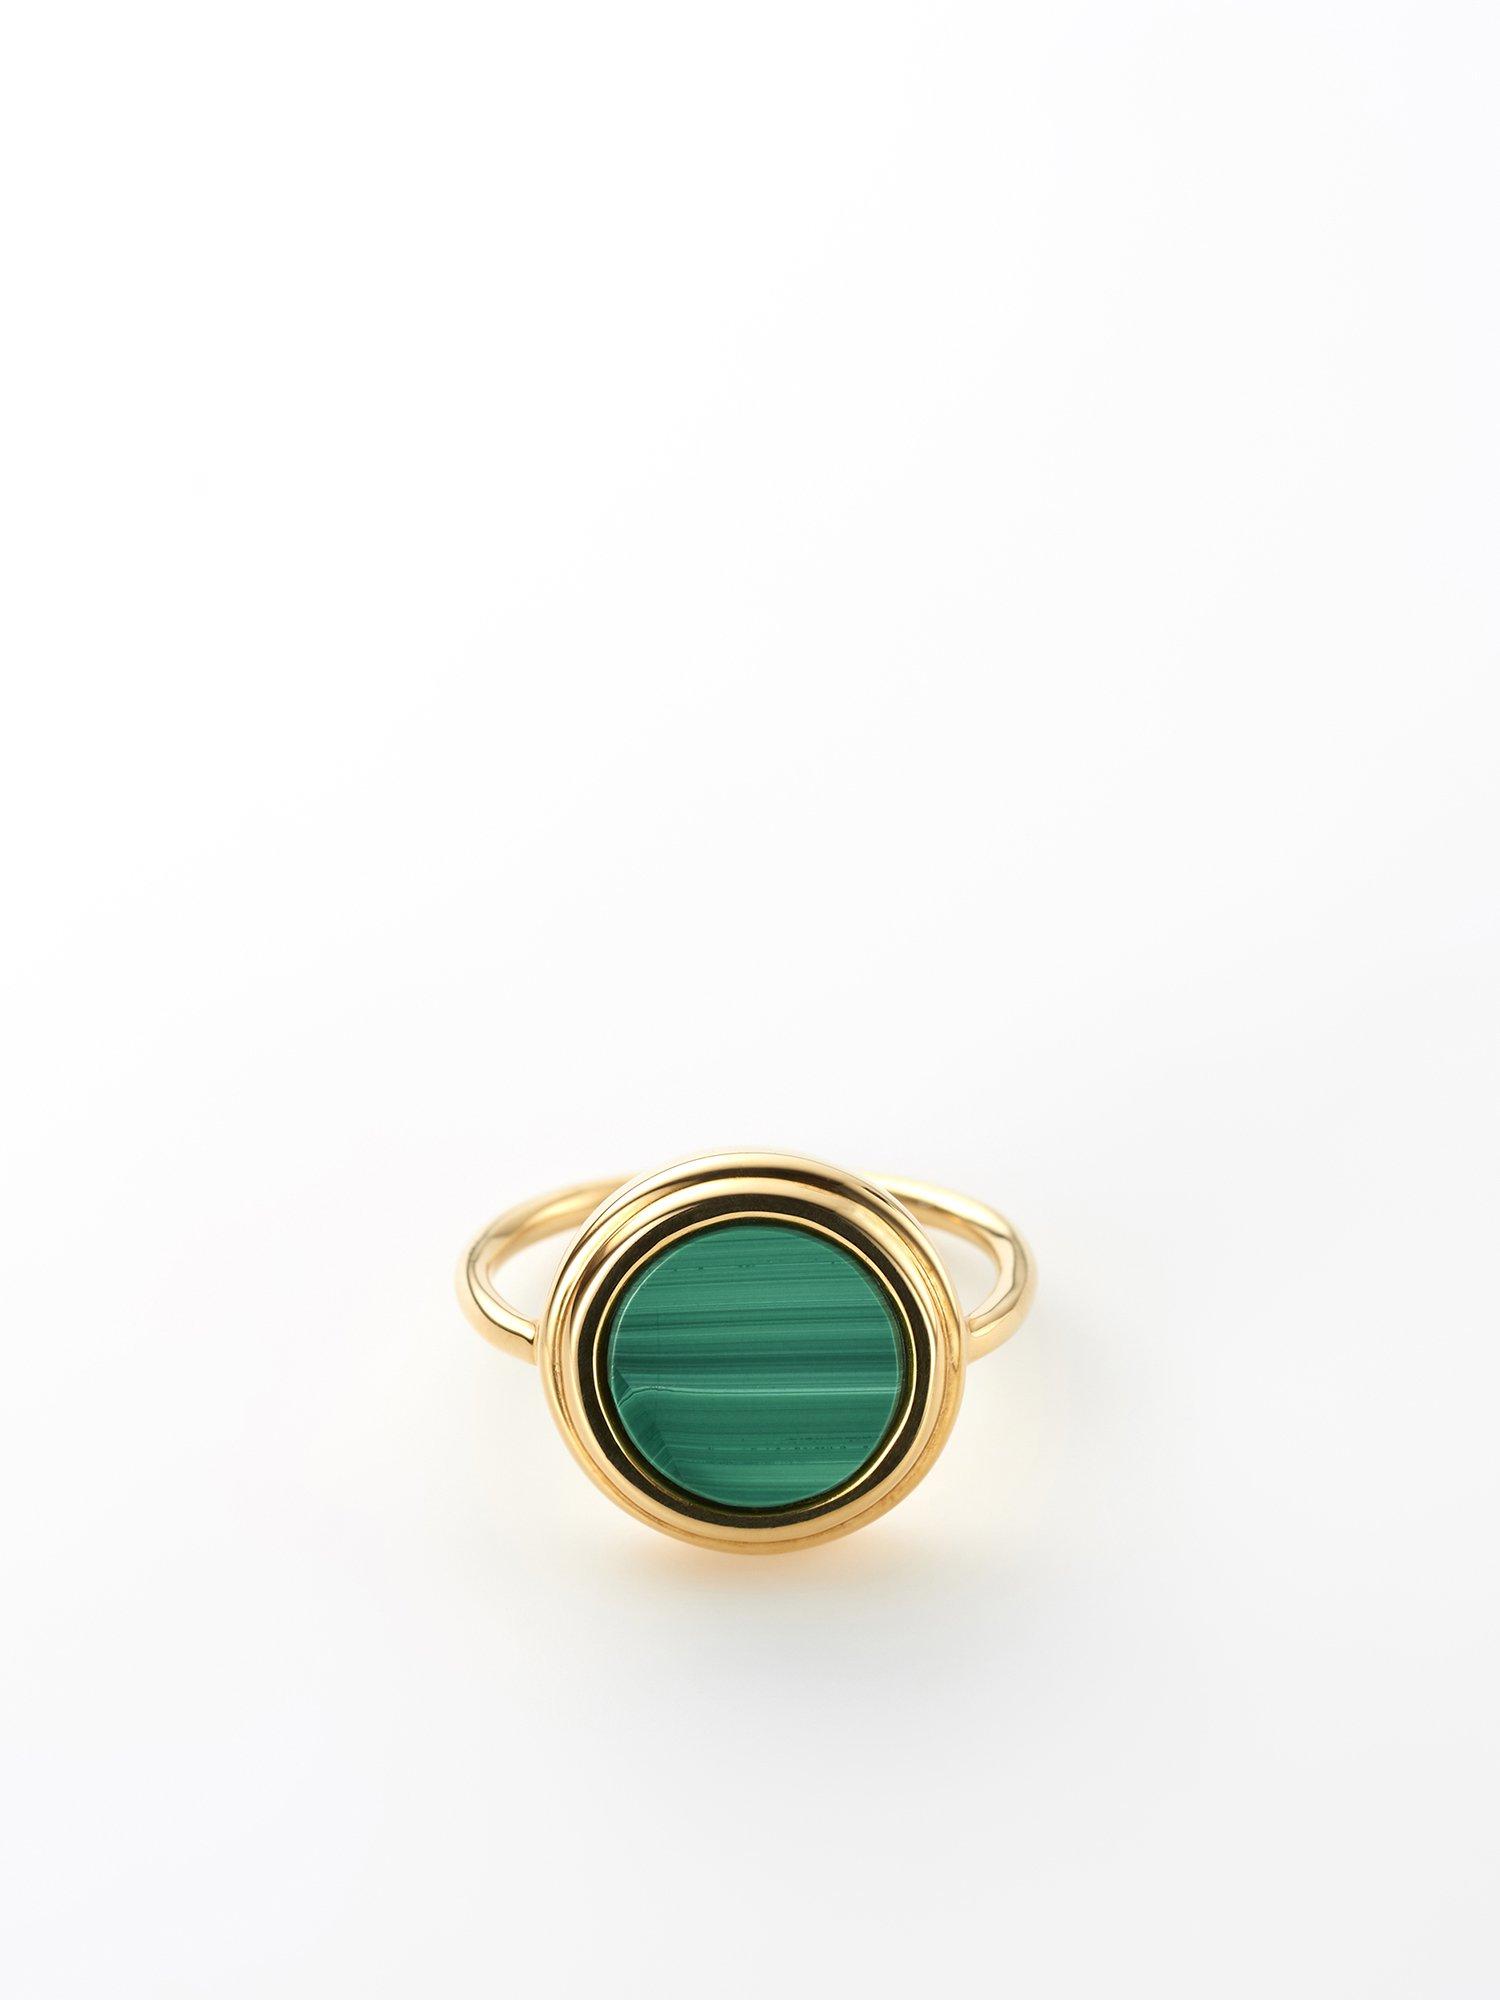 SOPHISTICATED VINTAGE / Planet ring / Malachite / 13号 / 在庫商品